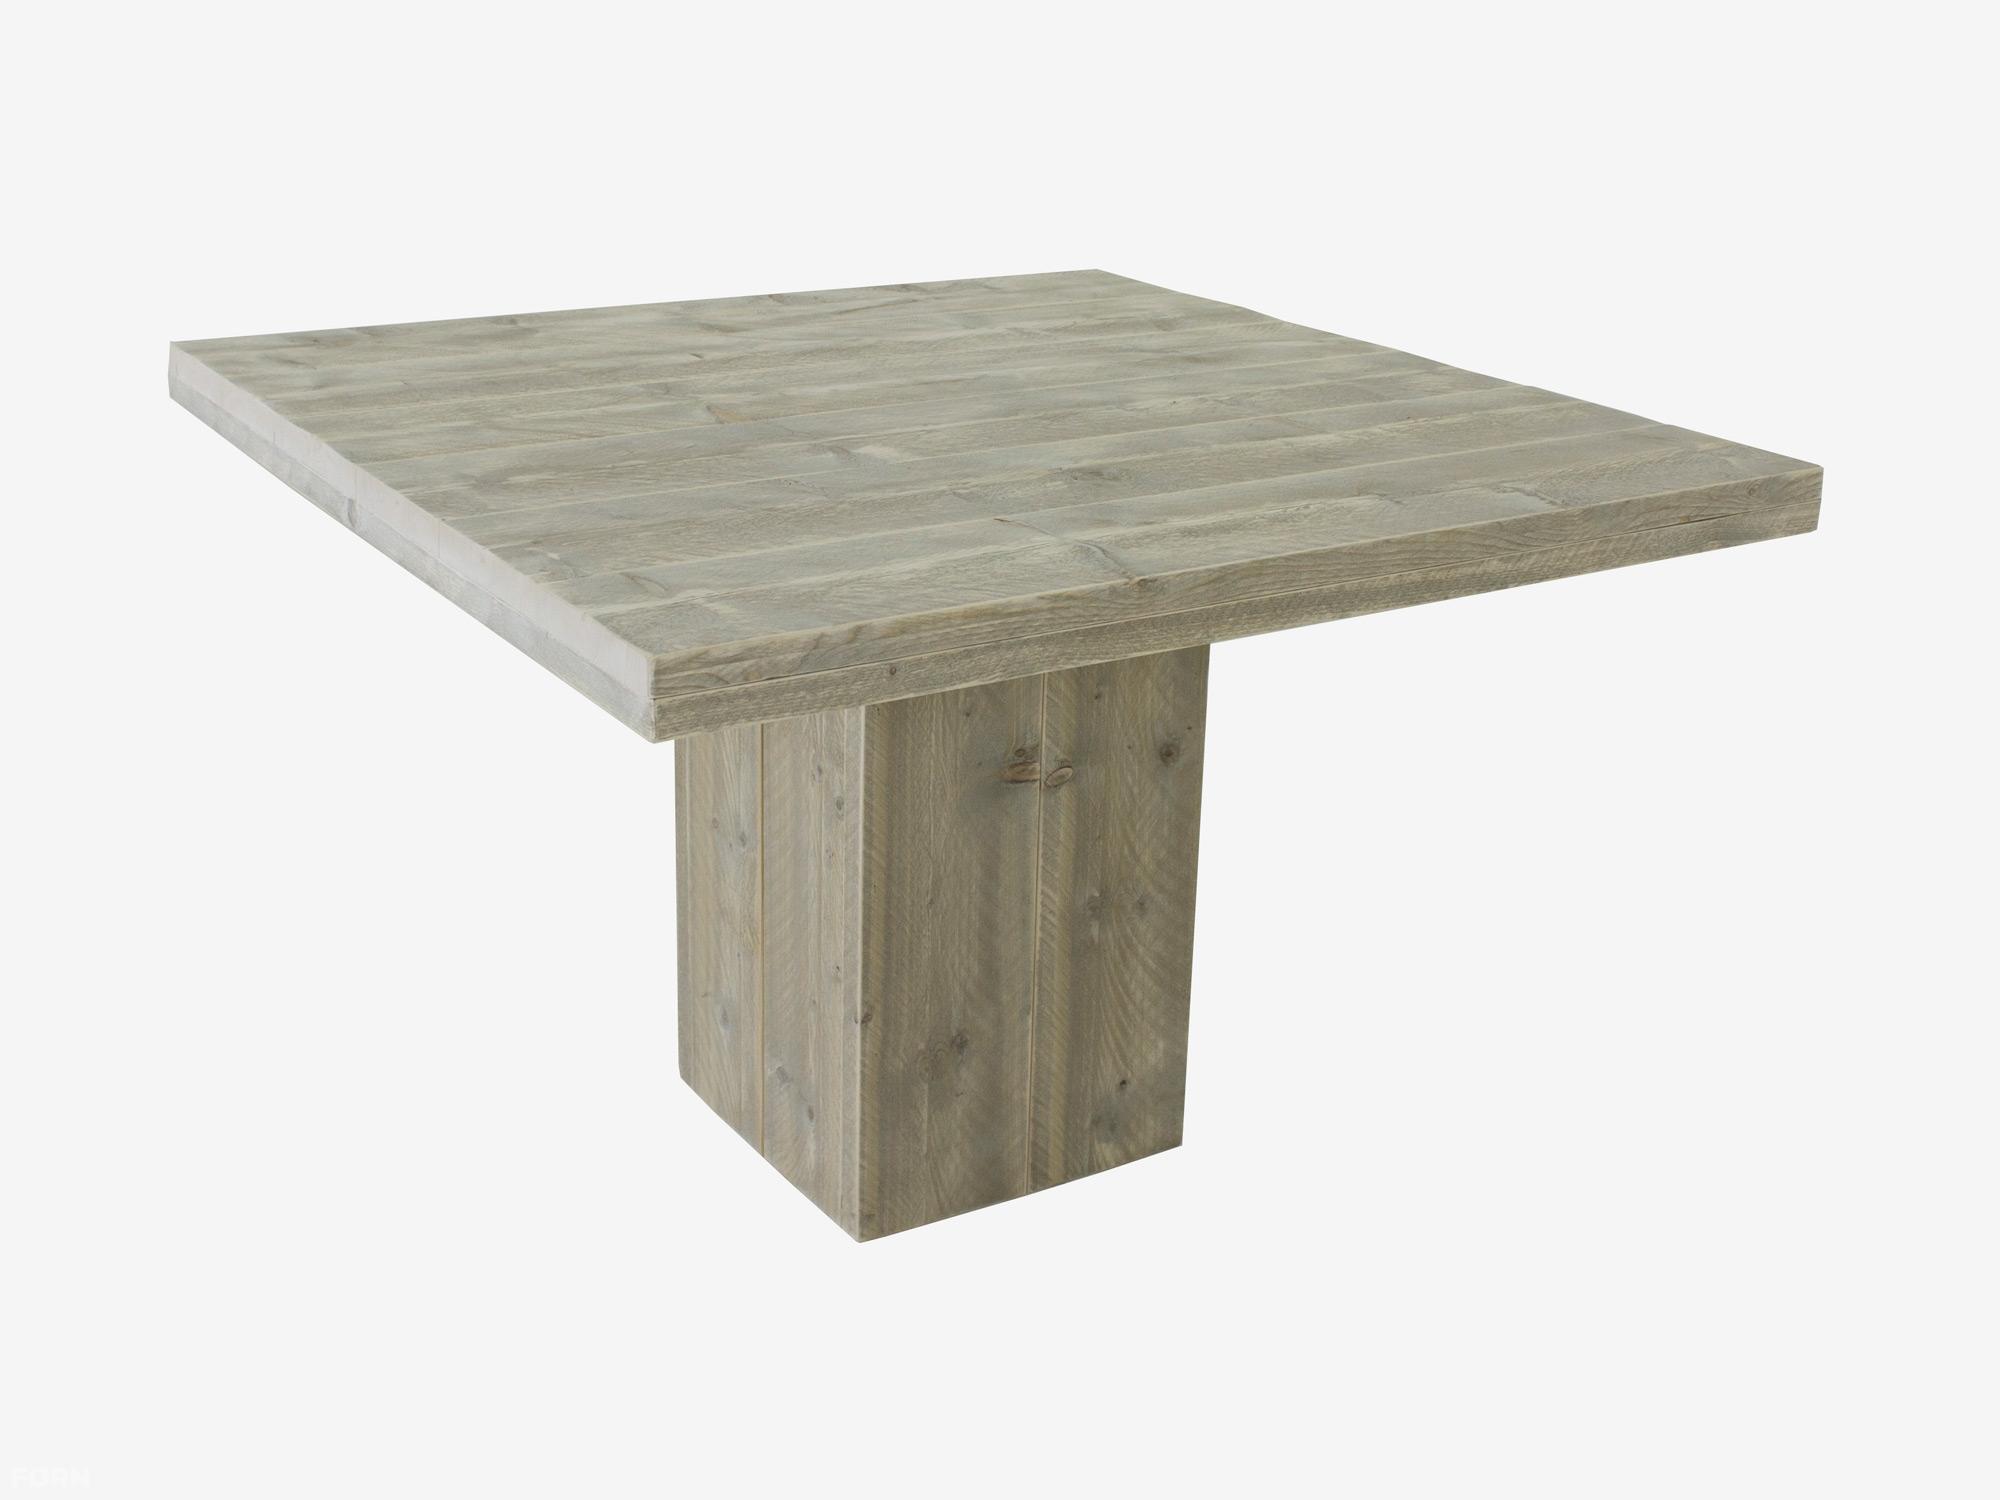 Bol steigerhouten tafel obelix